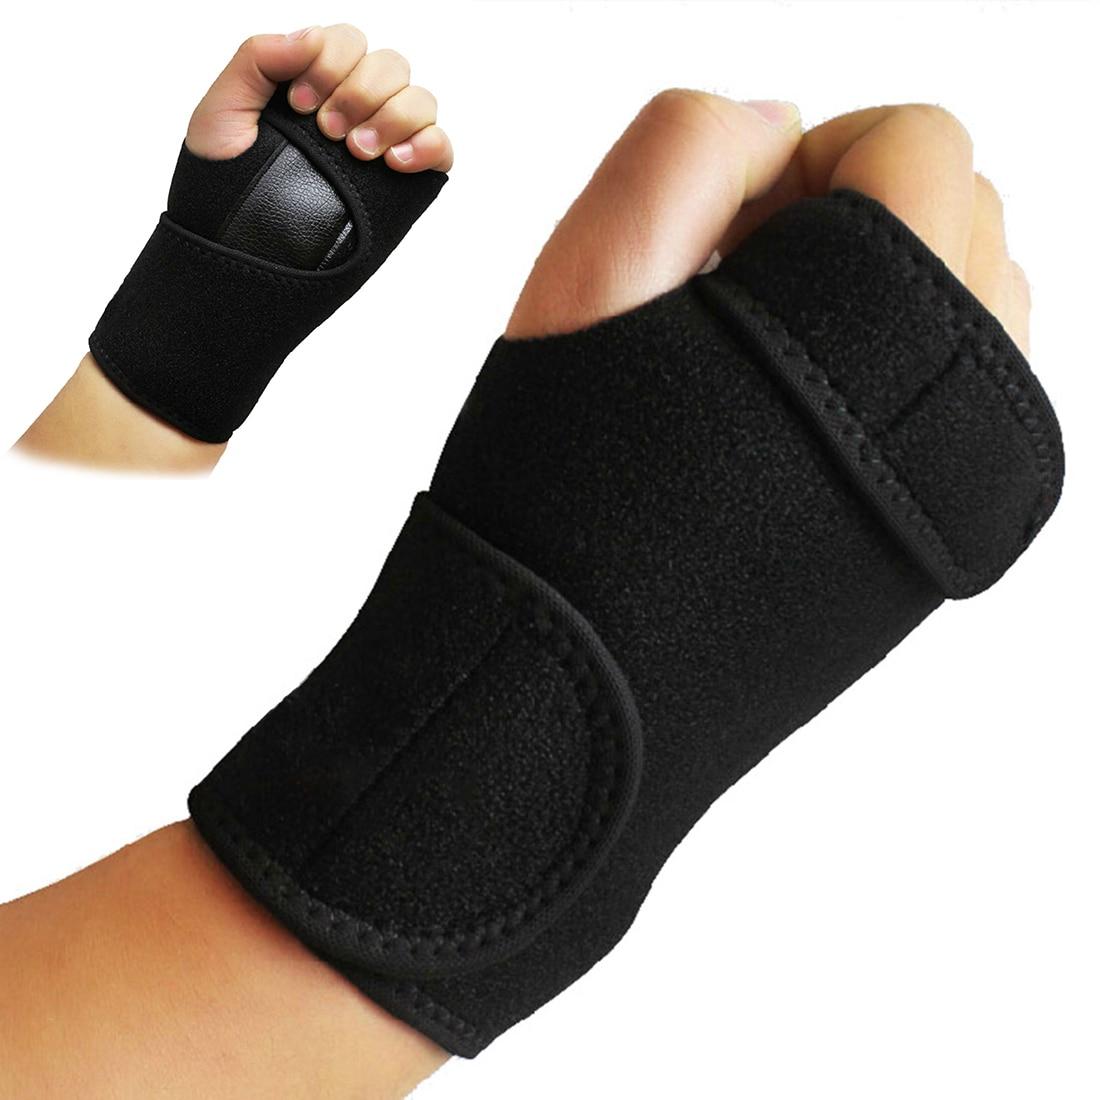 Hot sale Wristband Bandage Orthopedic Hand Brace wrist wraps Support Finger Splint Carpal Tunnel Syndrome